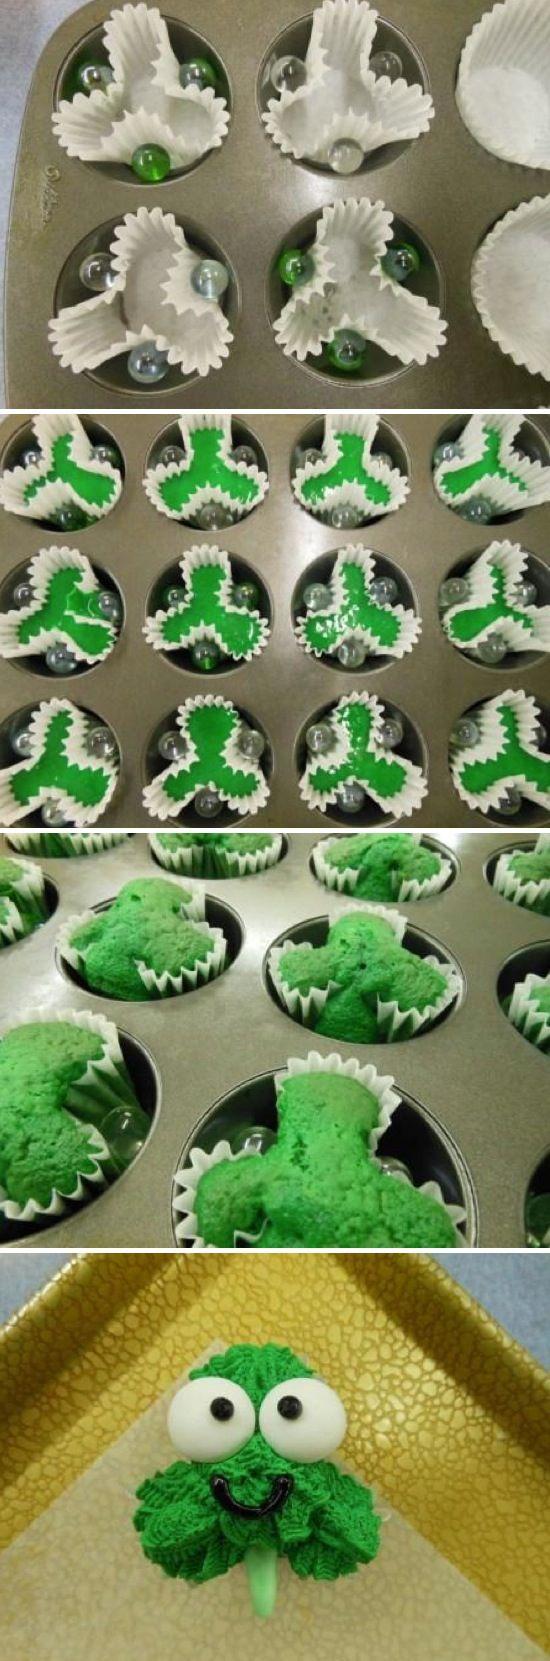 Simple Recipes Shamrock Cupcakes Cupcakes Easy Recipes